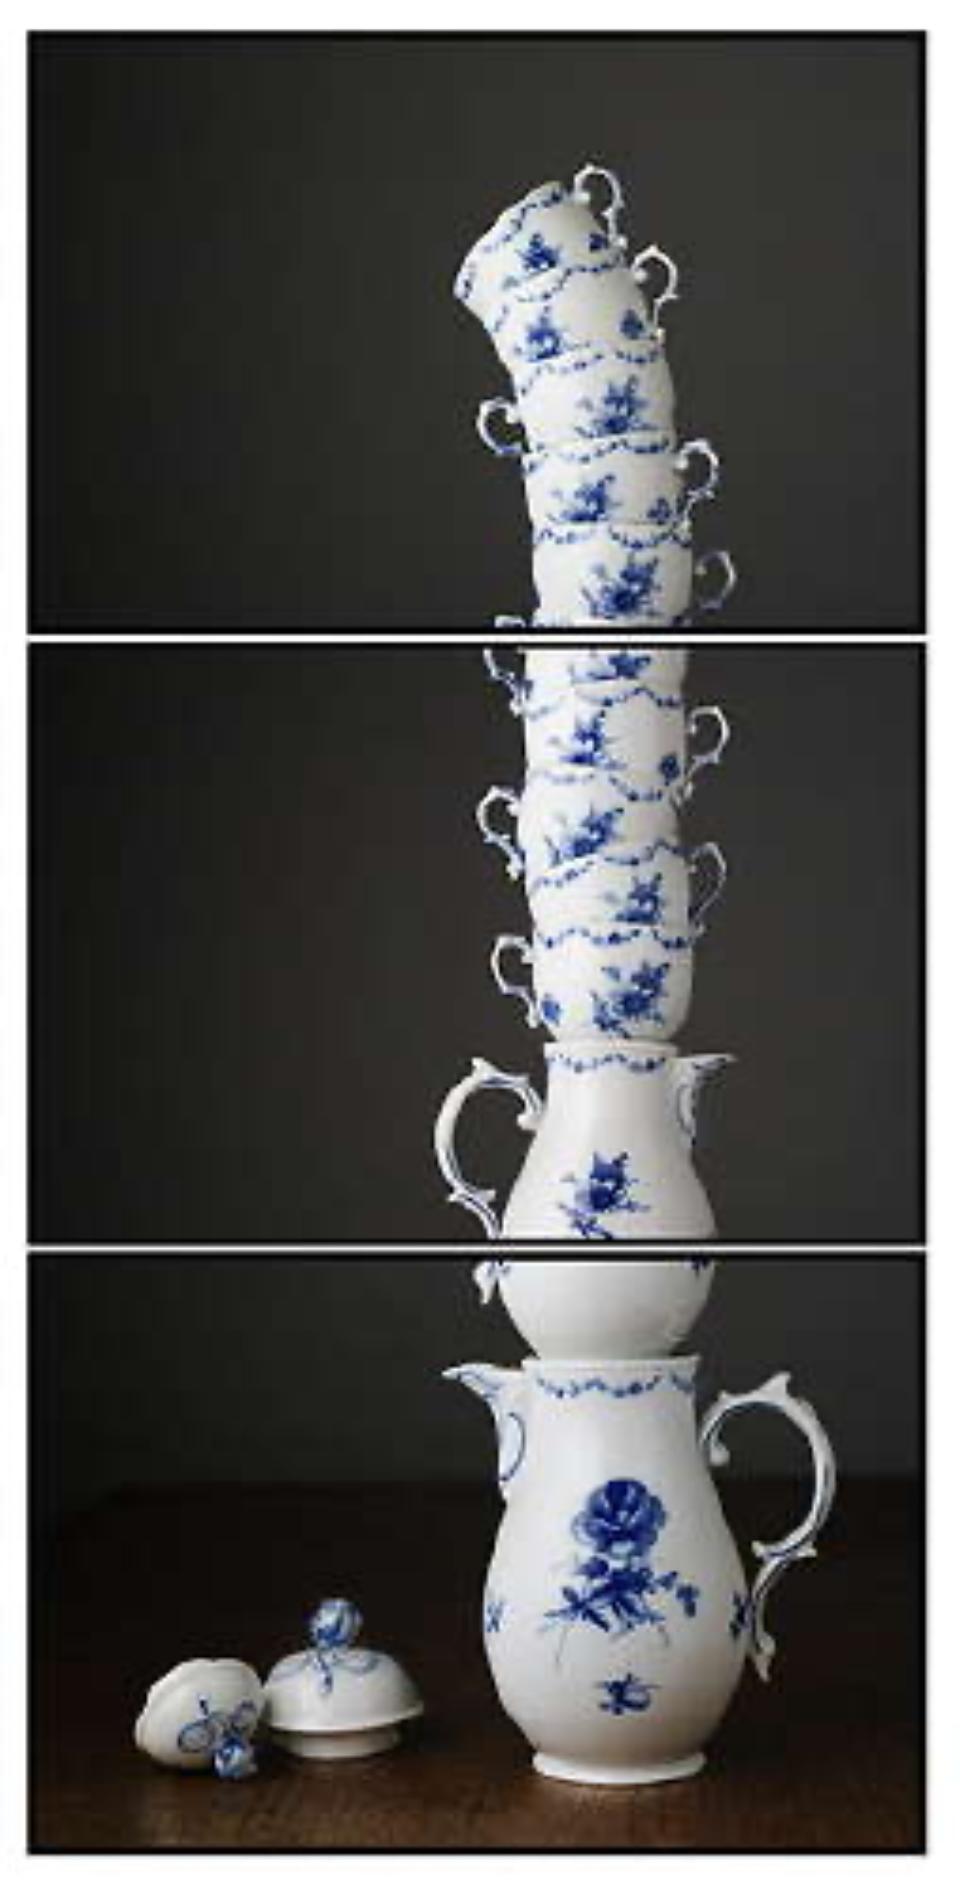 Joachim Froese: Achive #8 2008 3 archival pigment inkjet prints 93 x 46 cm Ed. 12